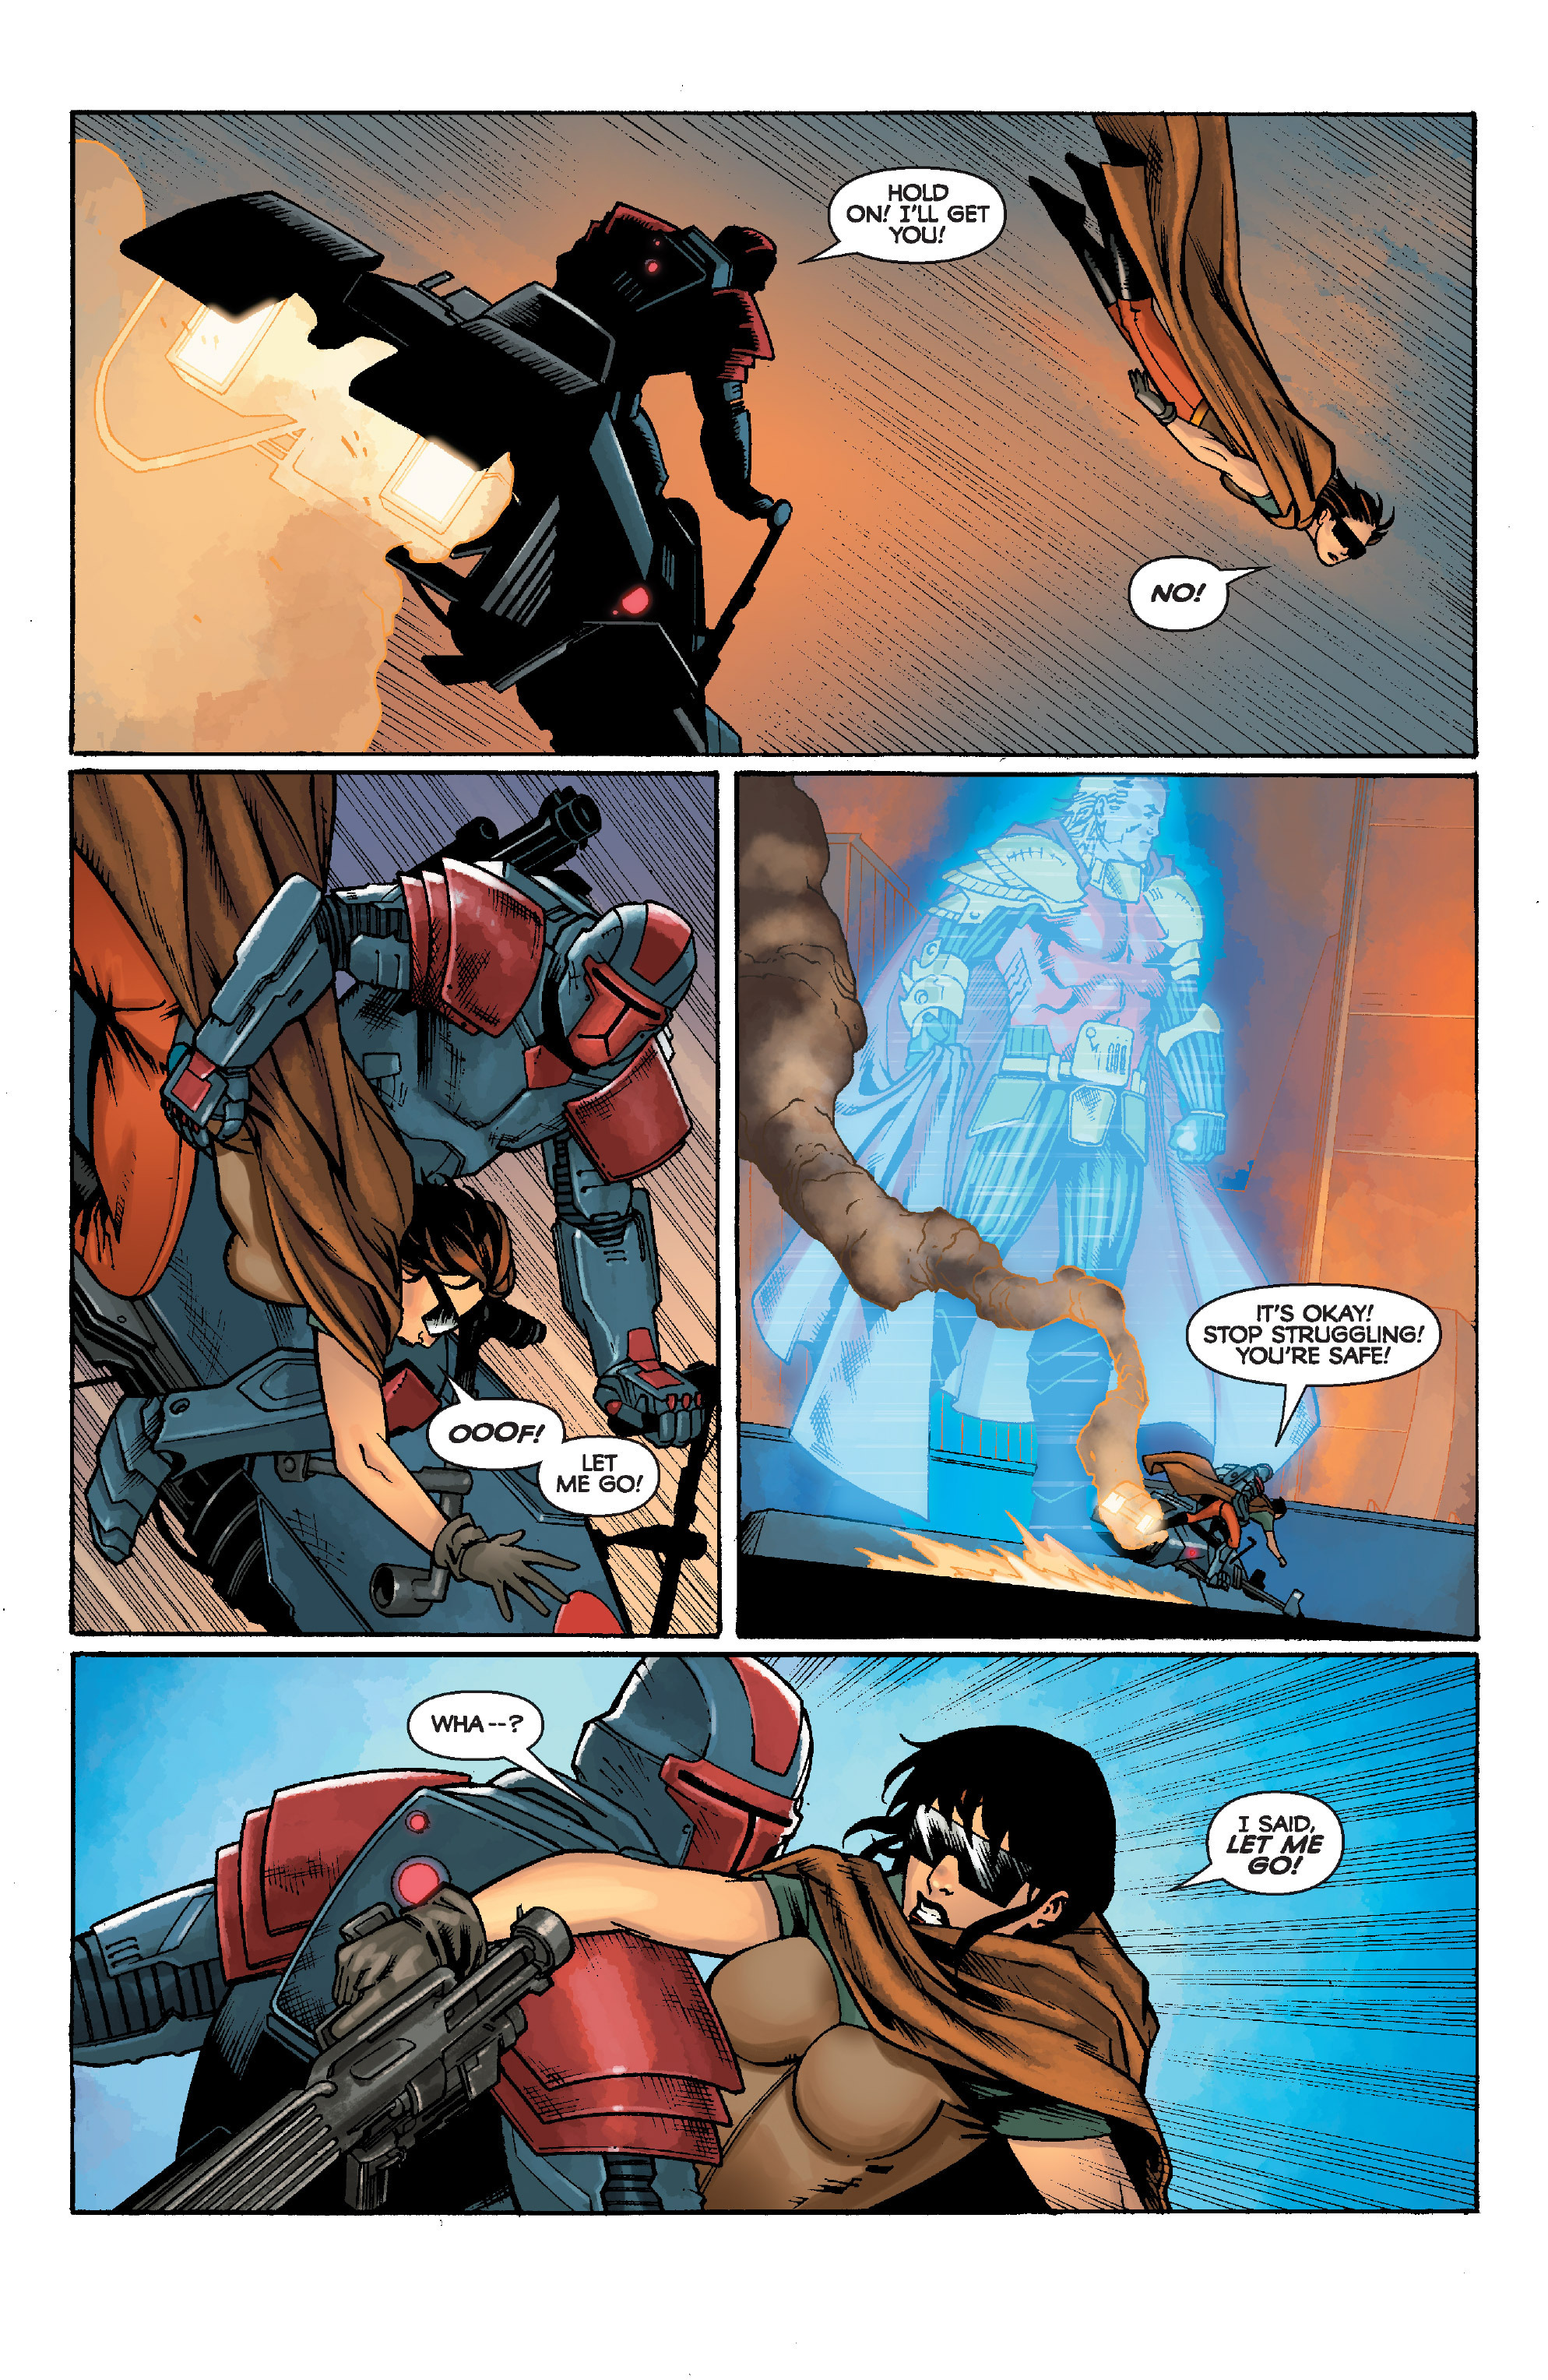 Read online Star Wars: Knight Errant - Escape comic -  Issue #1 - 5